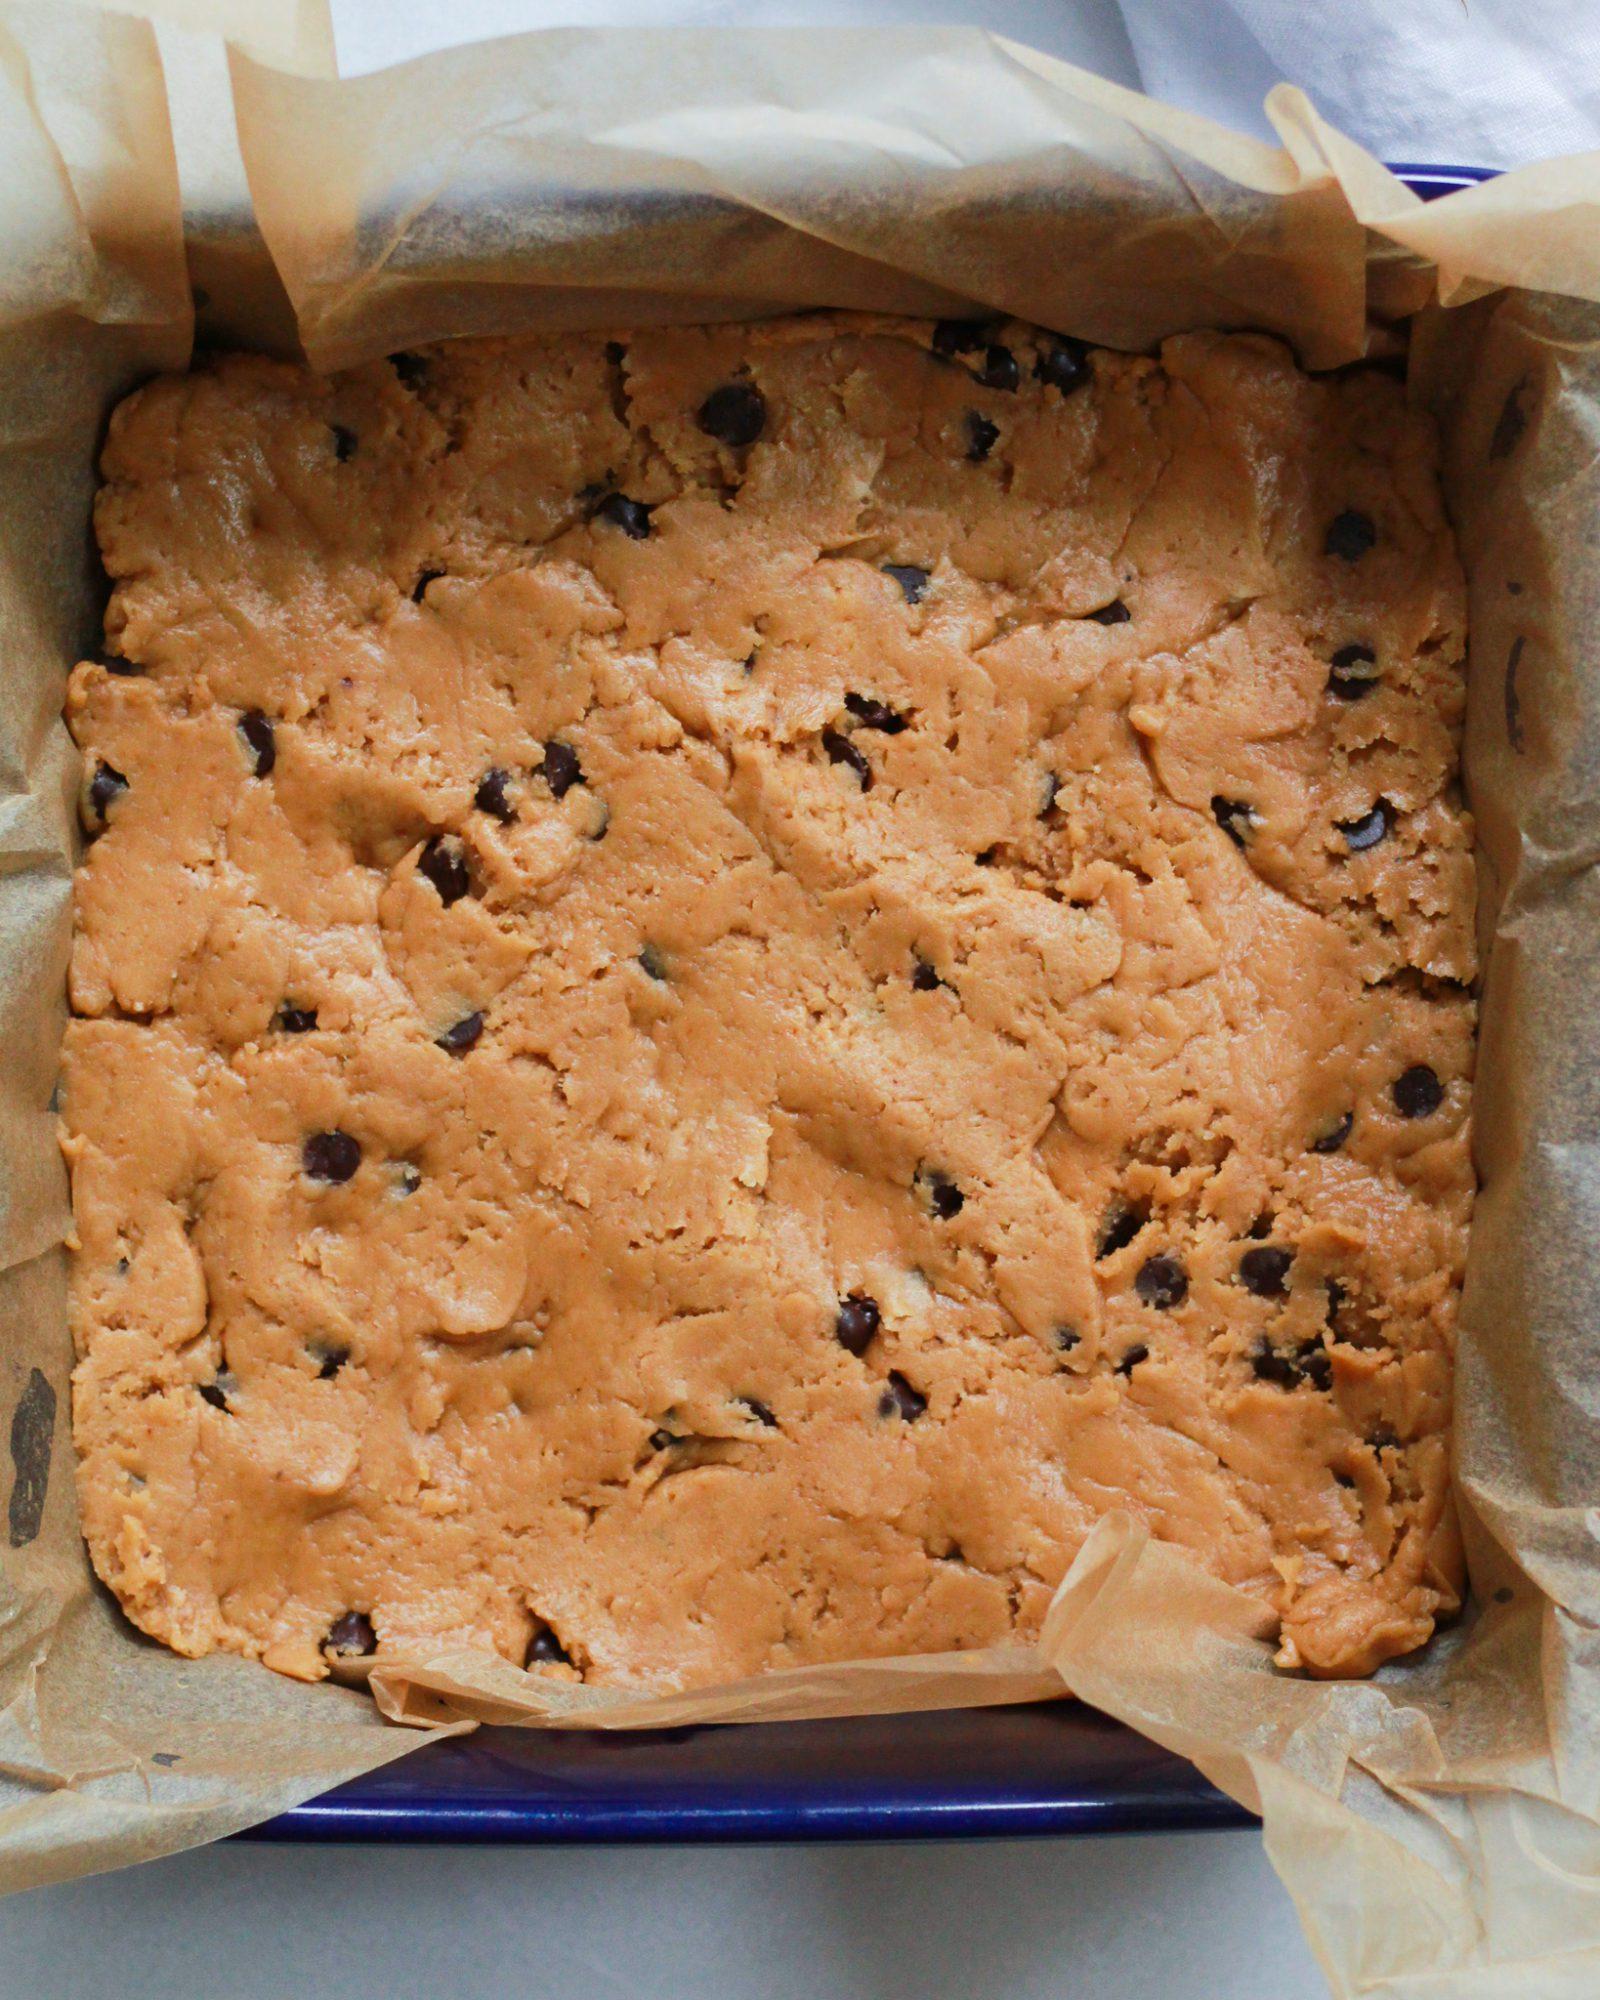 vegan chocolate chip cookie dough in baking dish